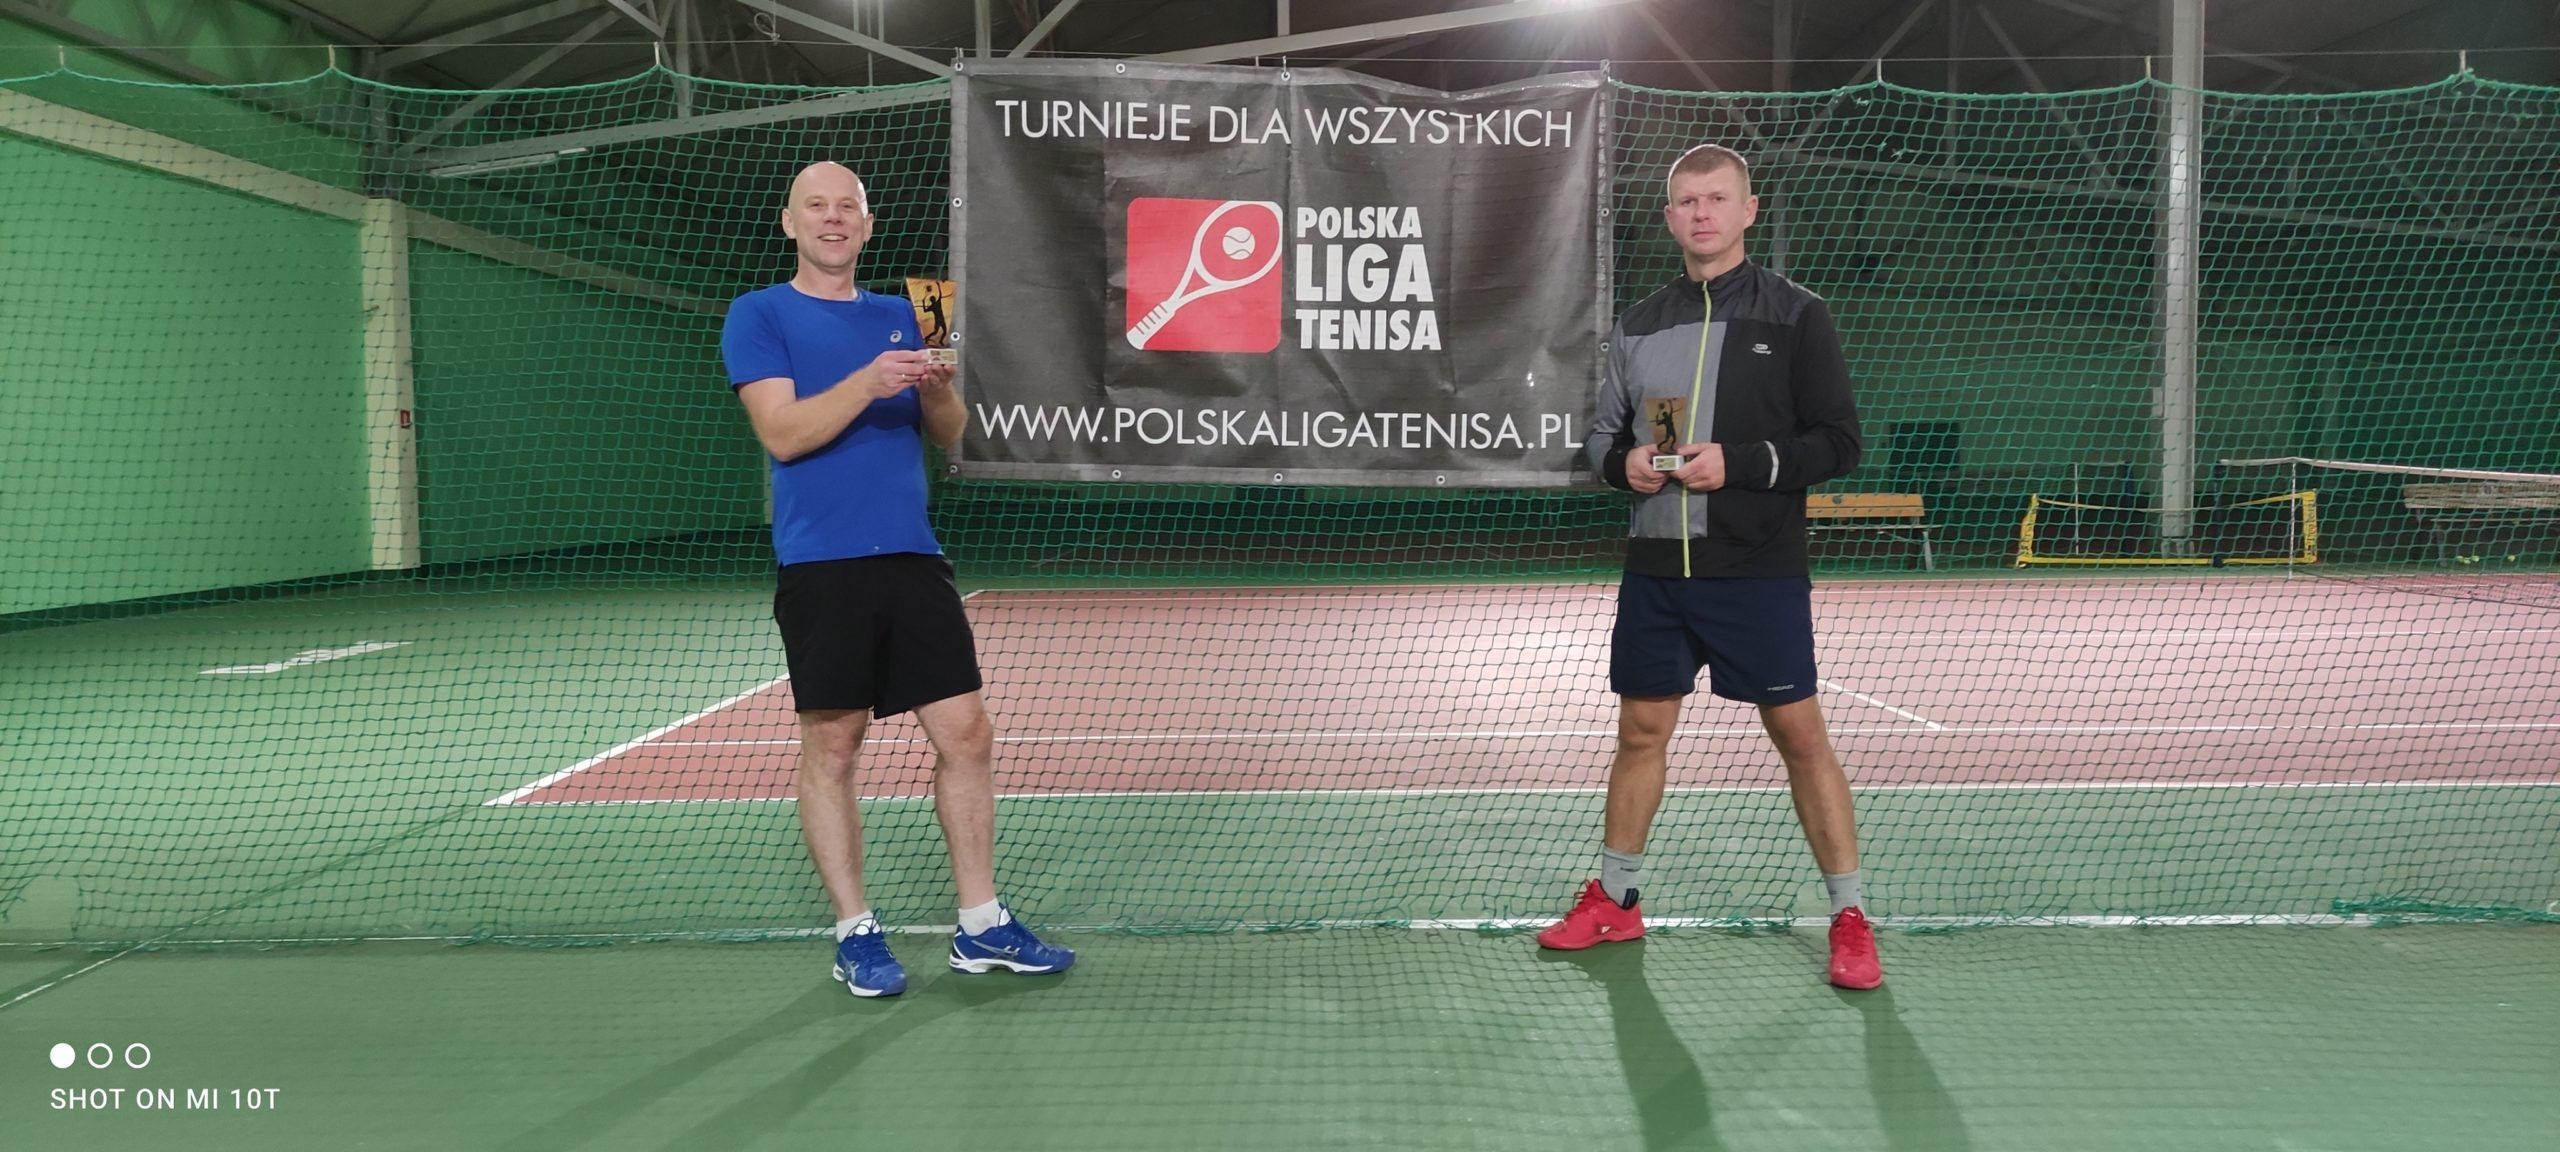 Polska Liga Tenisa. Nieoczekiwany triumf debiutanta